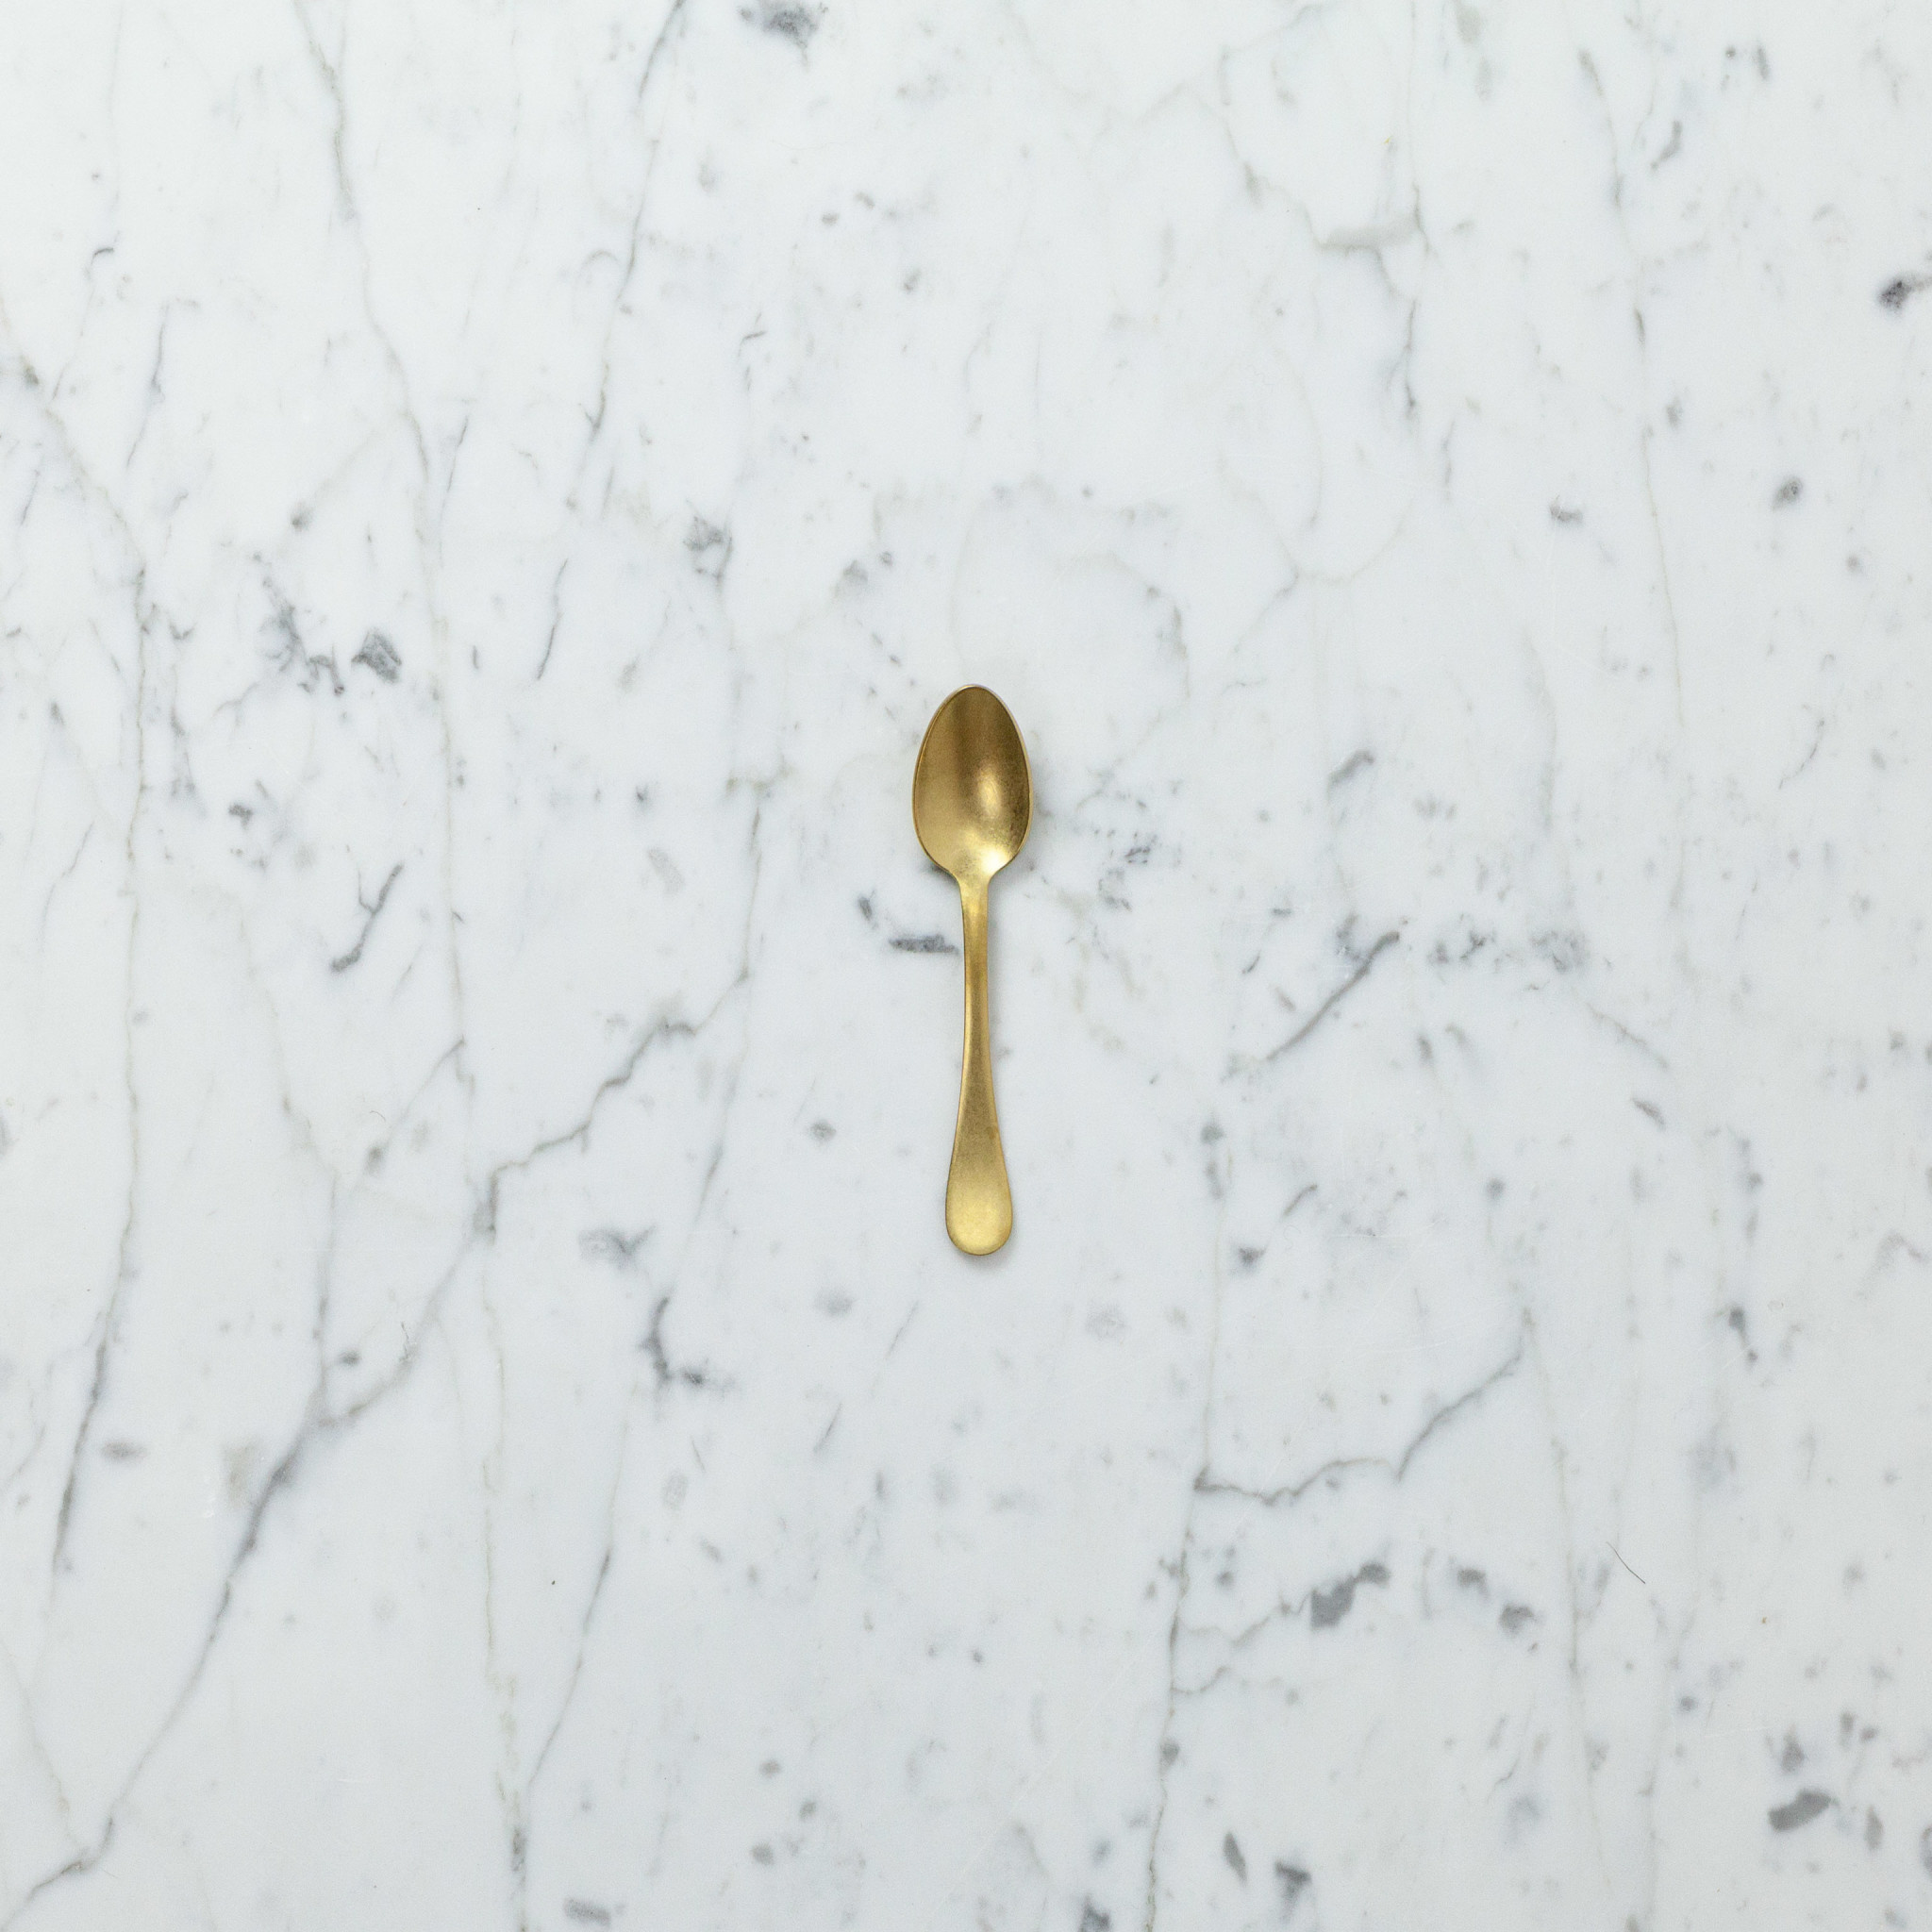 Italian Vintage Style Moka Spoon - Vintage Gold